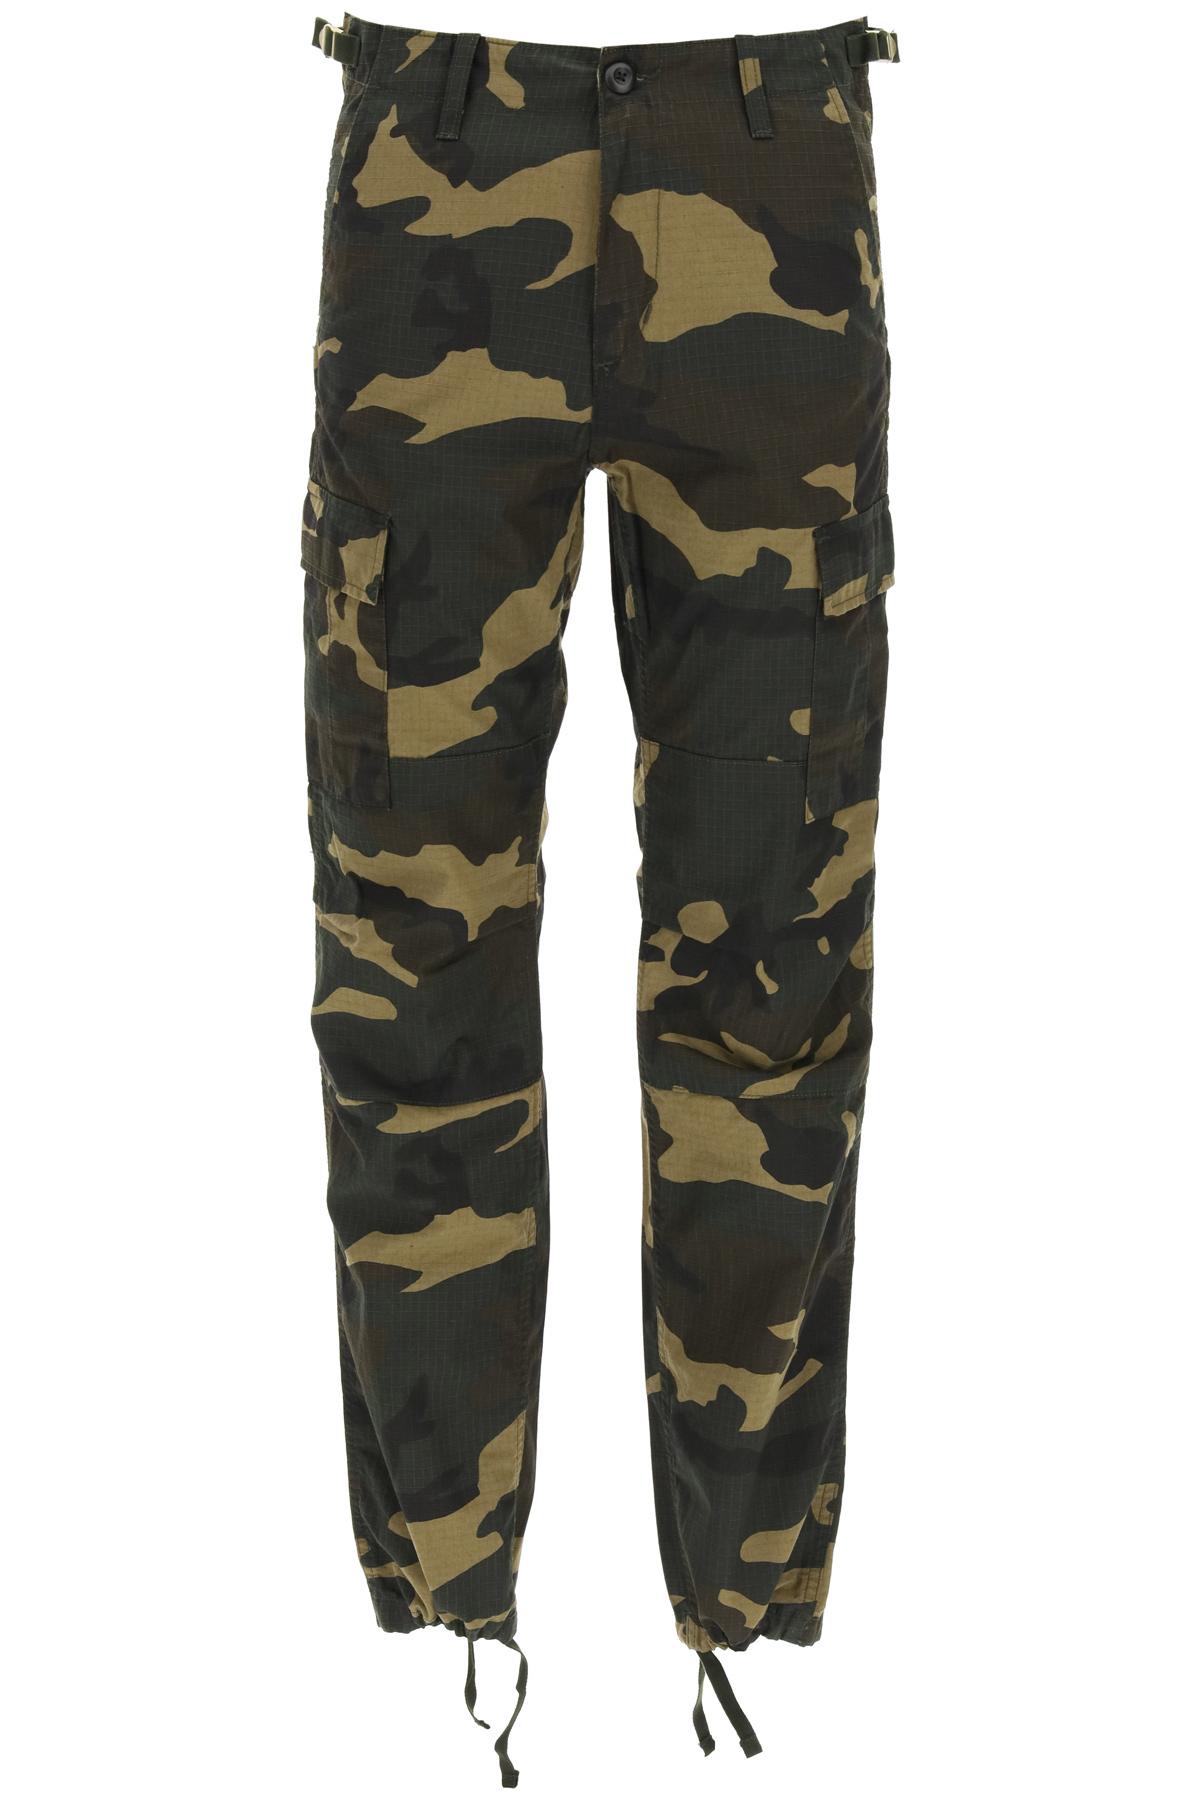 Carhartt pantaloni aviation cargo camouflage